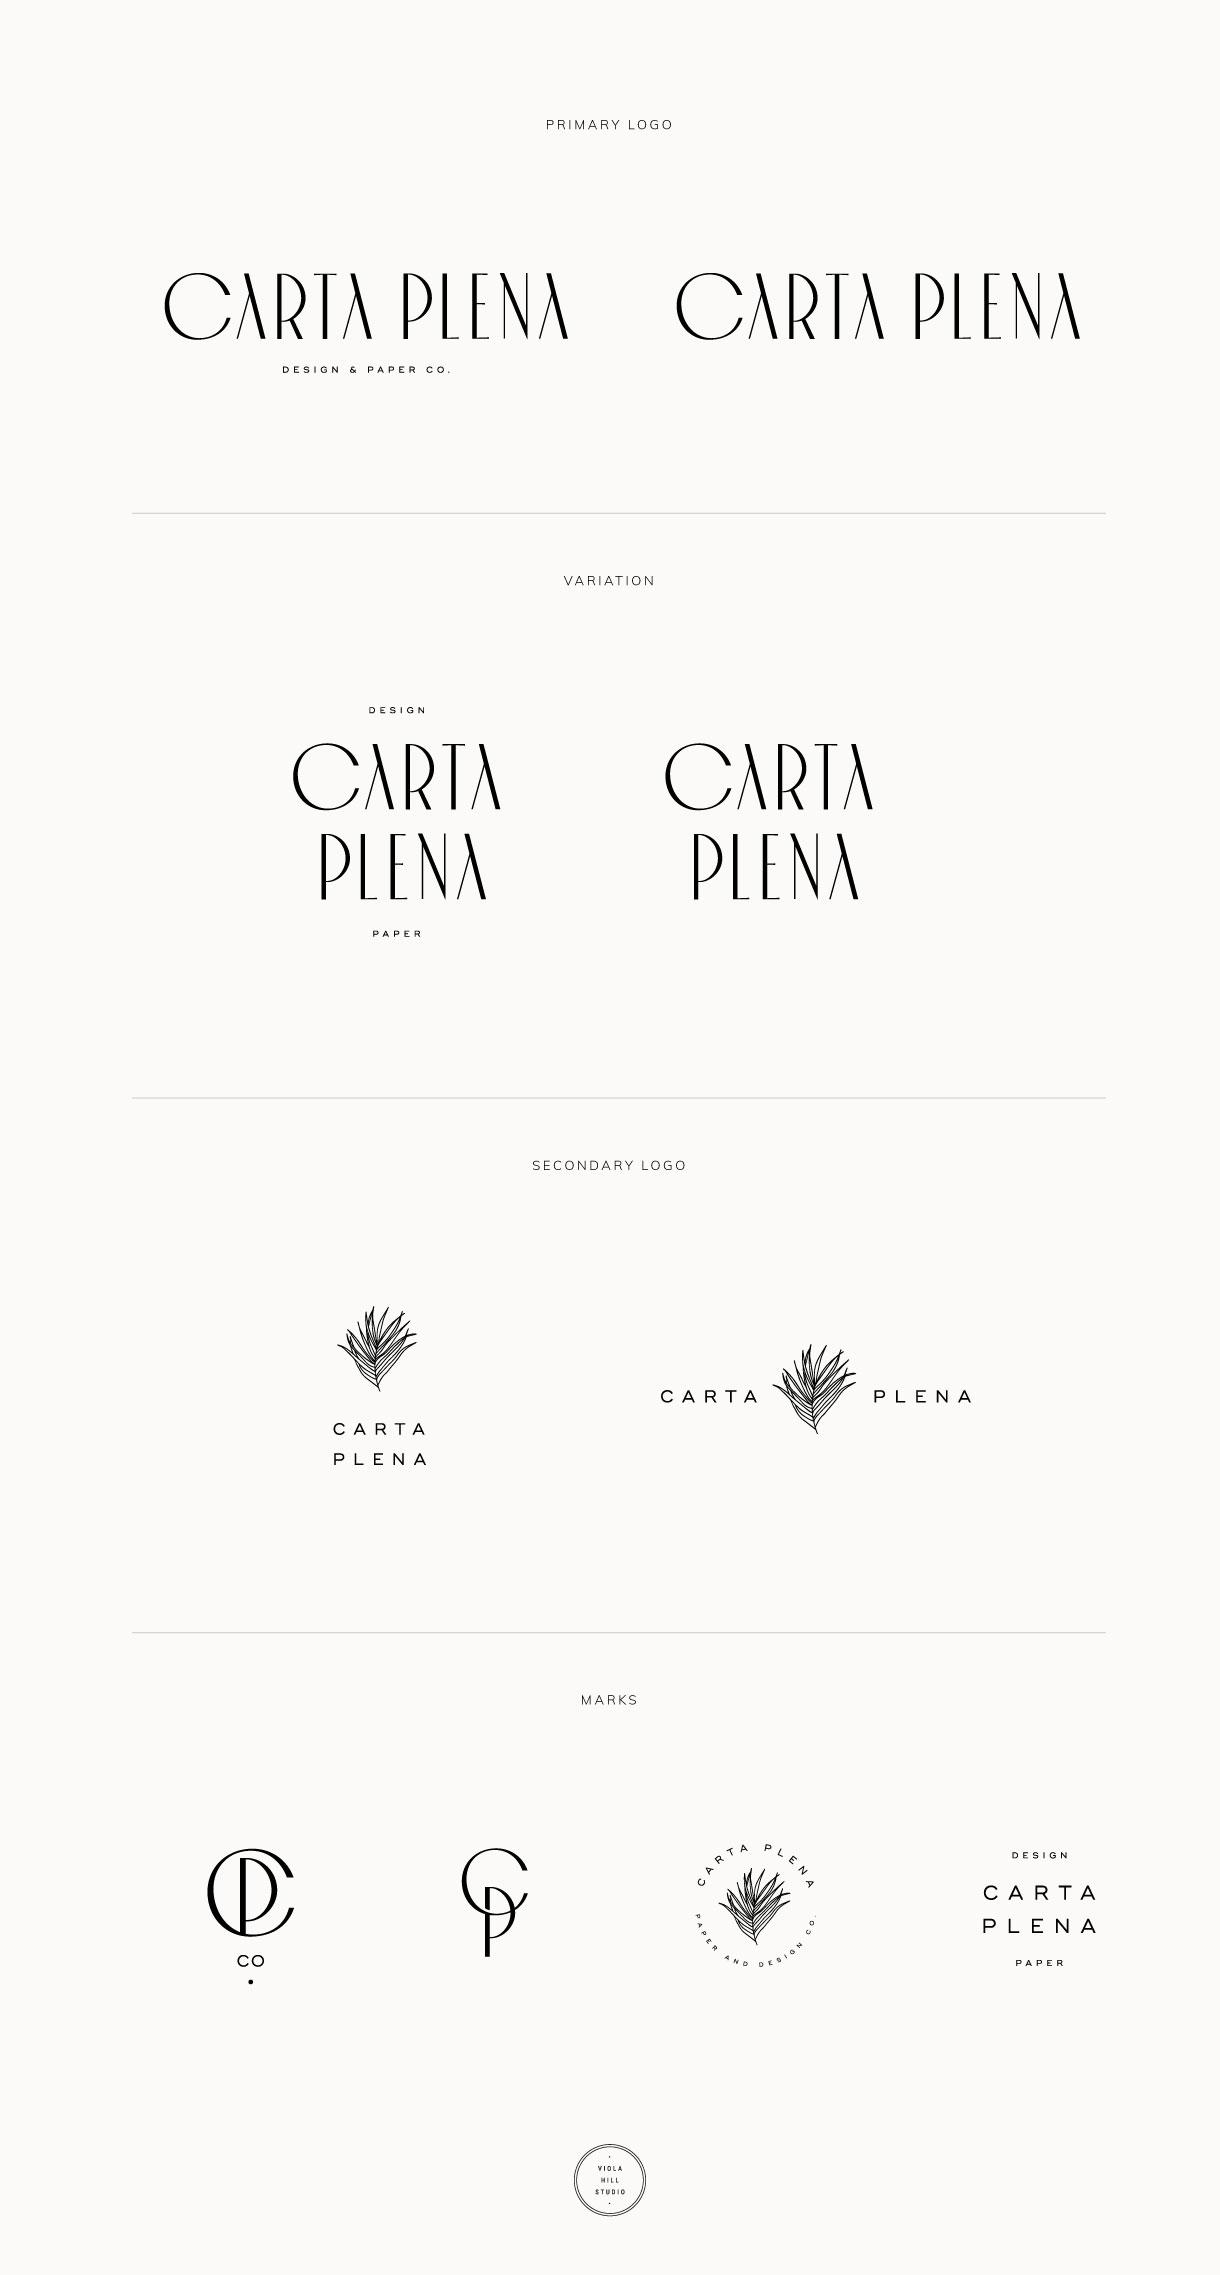 Carta Plena Custom Brand Design by Viola Hill Studio